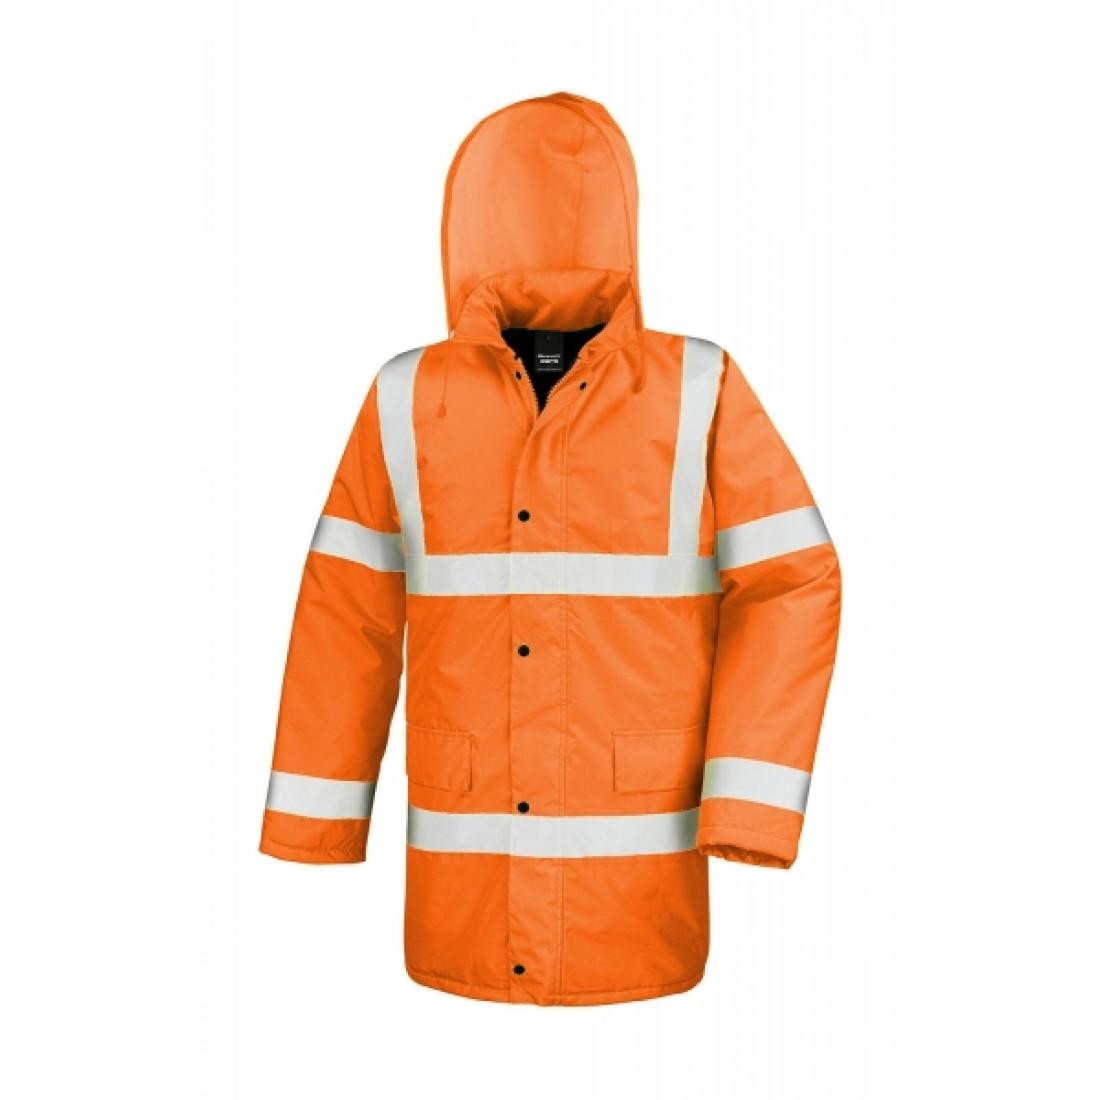 793f94d21b1 Ενδυση Εργασιας - Μπουφάν Core Hi-Viz Motorway Result Safe-Guard, R218X  πορτοκαλί